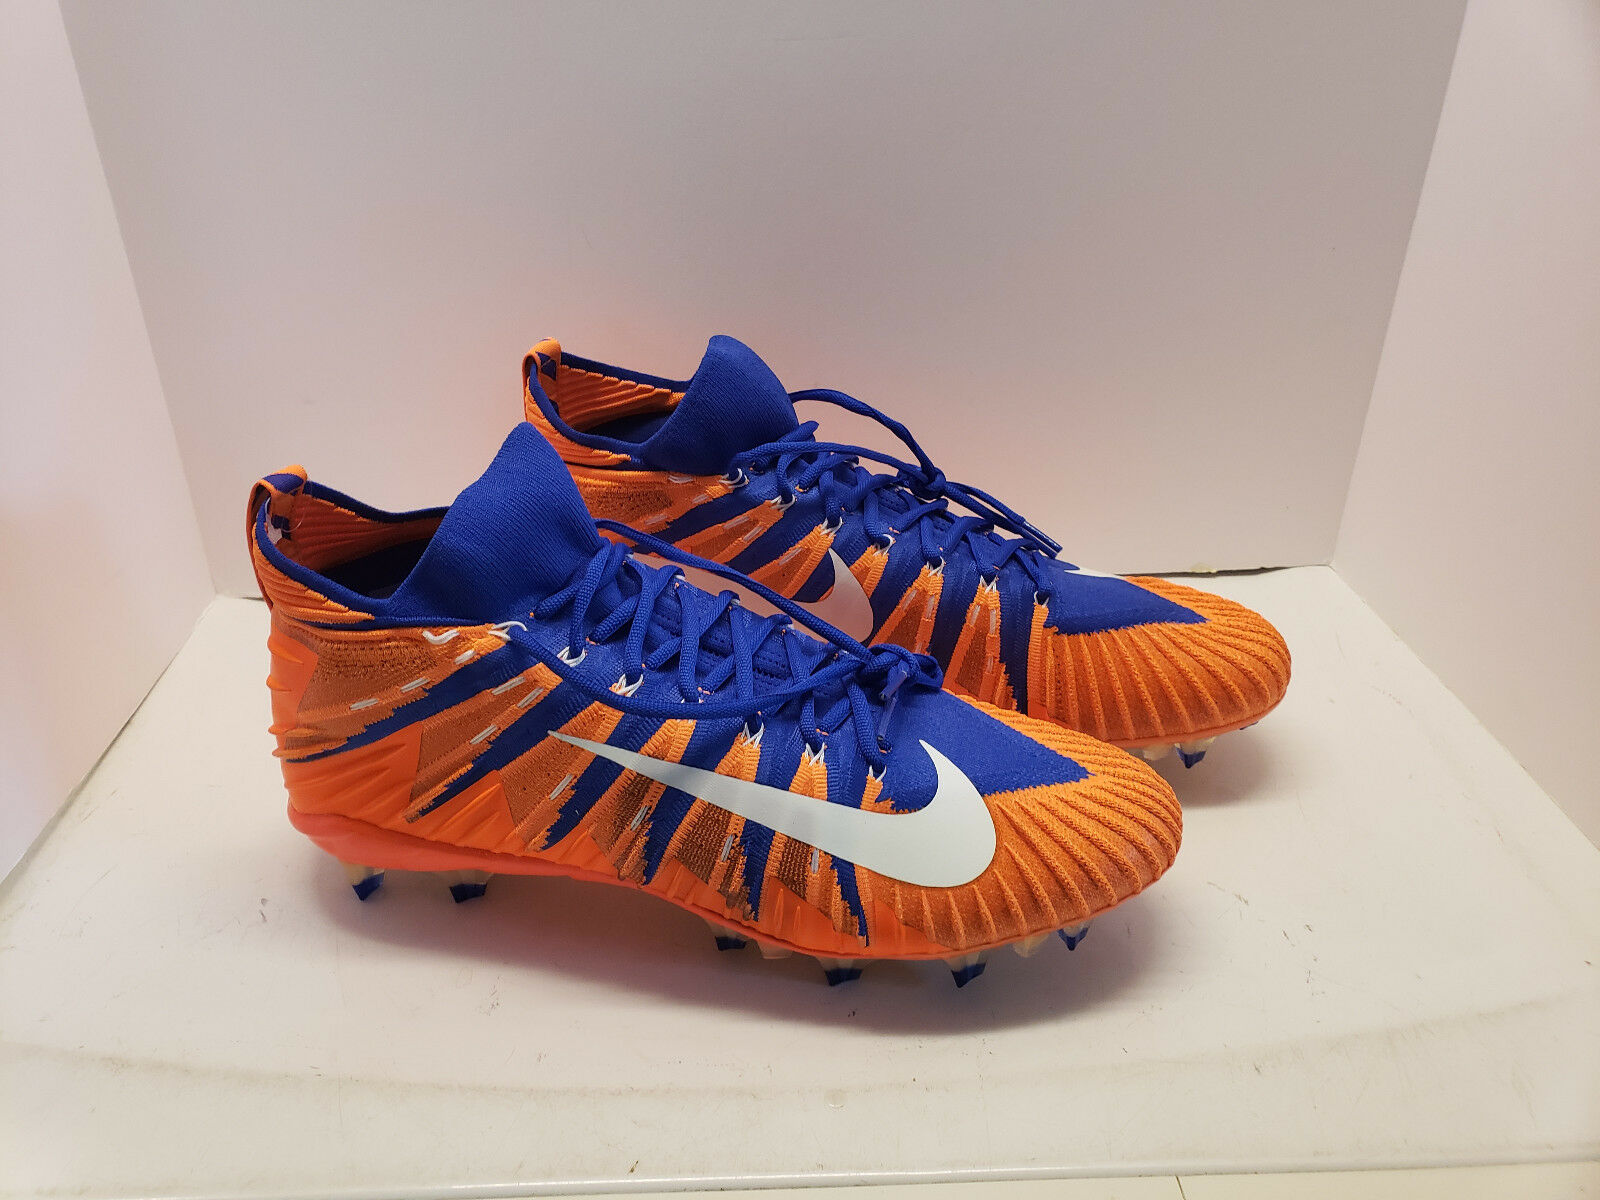 Nike Alpha Menace Elite Florida Gators arancia Football Cleats 877141-418 877141-418 877141-418 Sz 16 c51a74